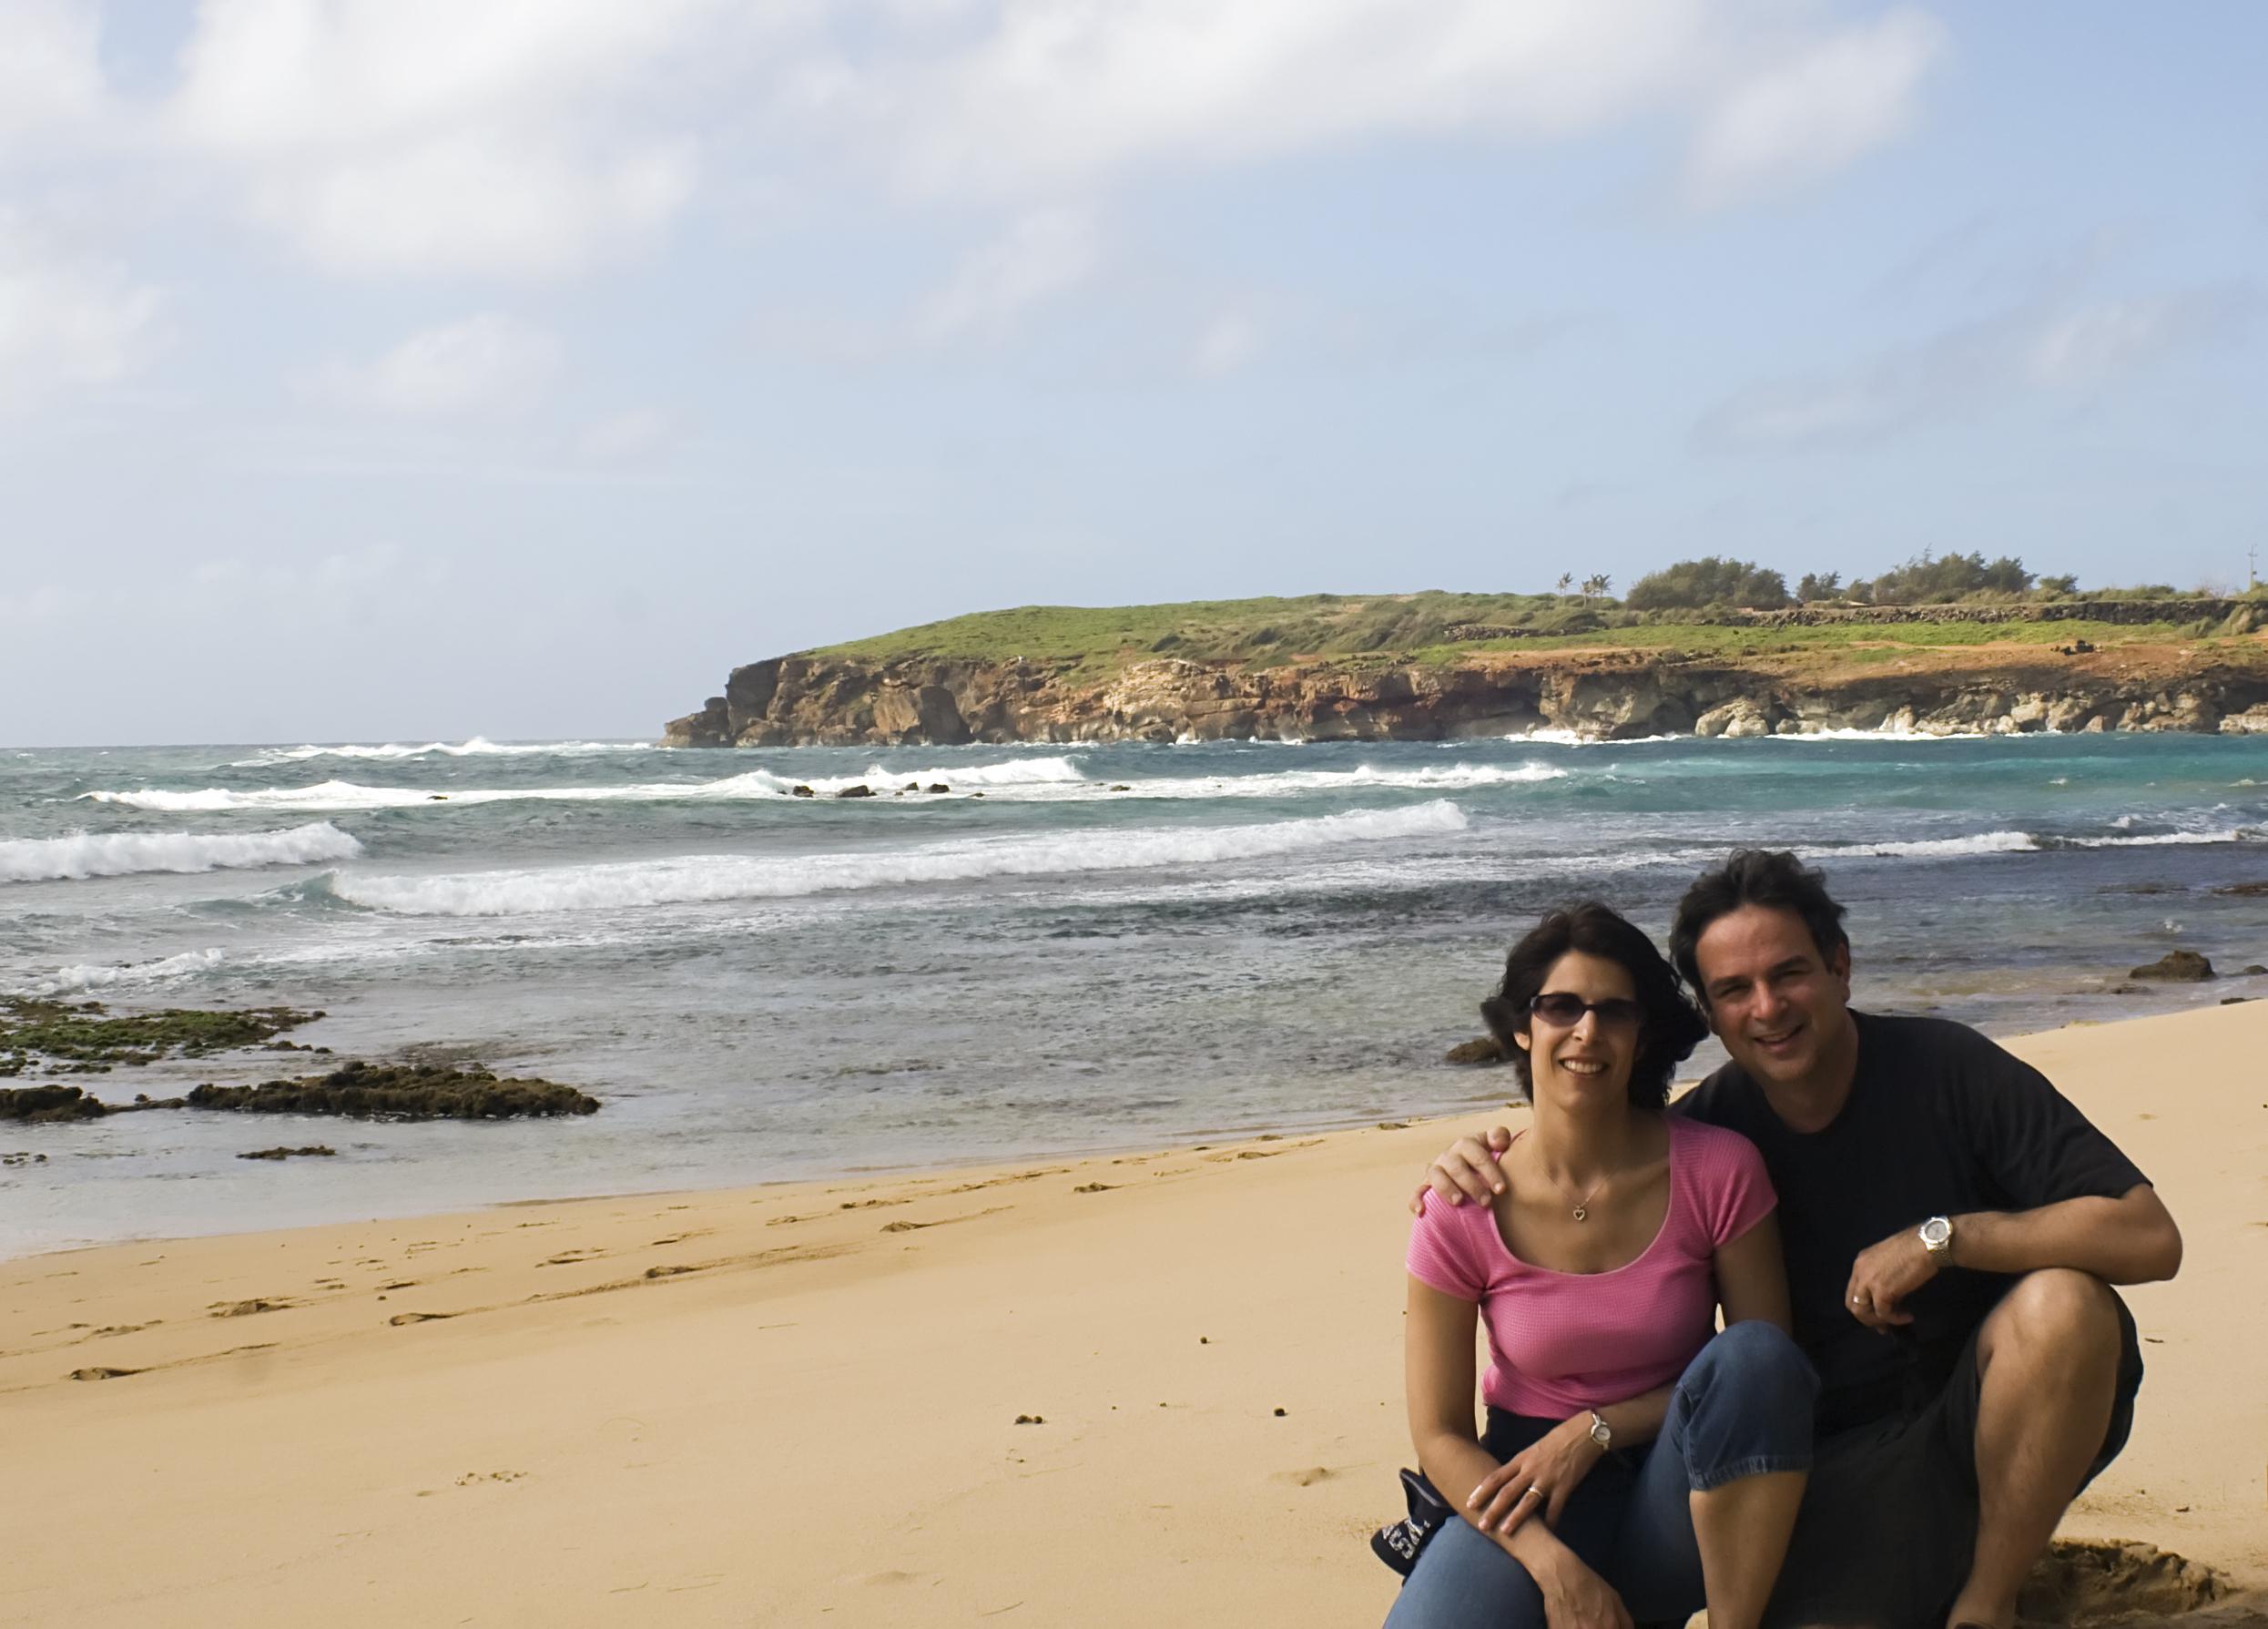 James & Korin Giordano, Realtors